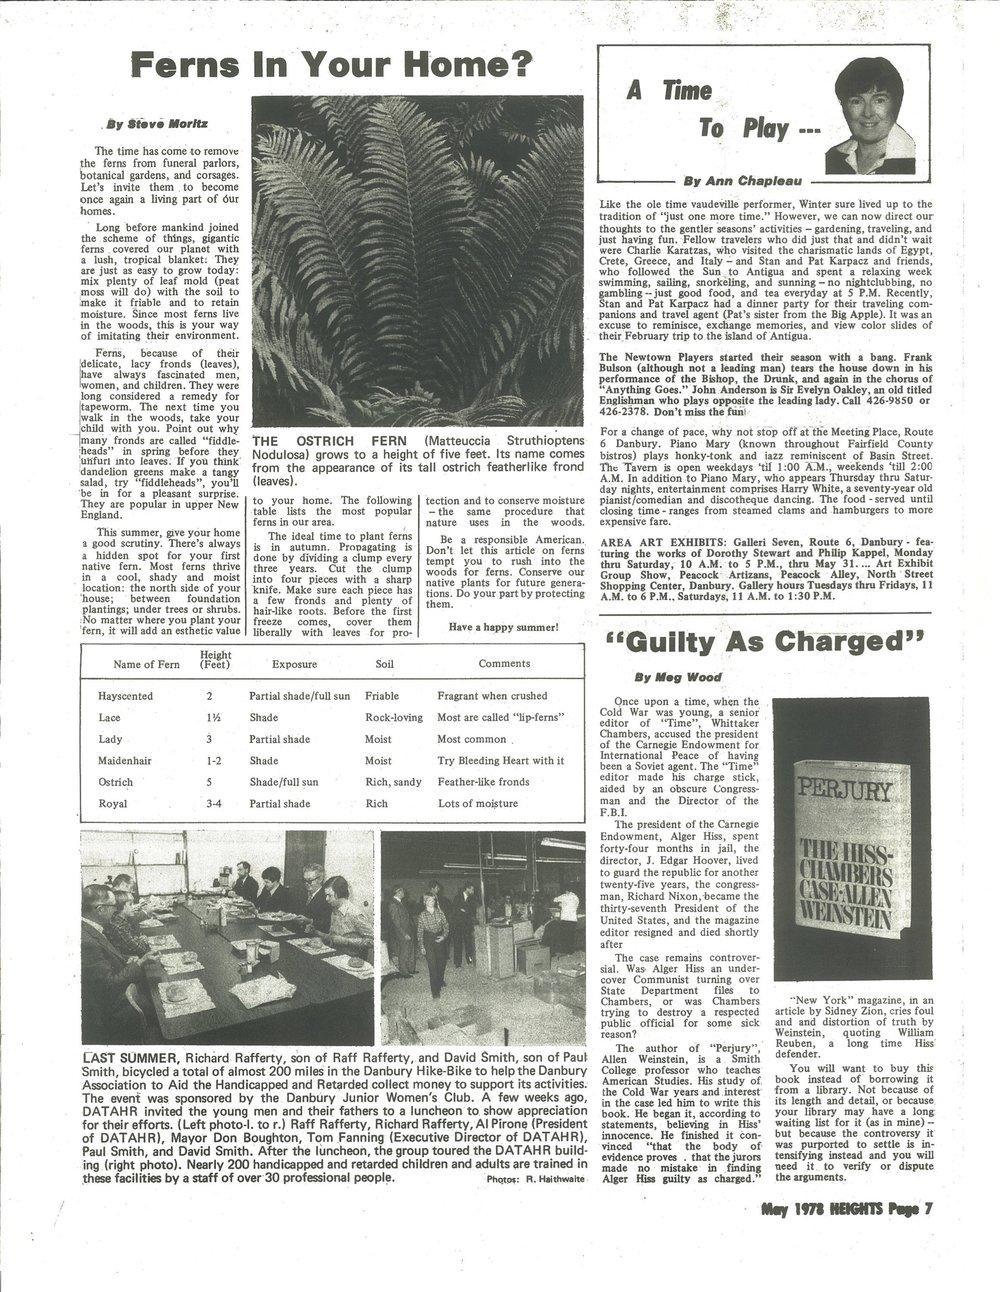 vol 11 num 2 page 7.jpg